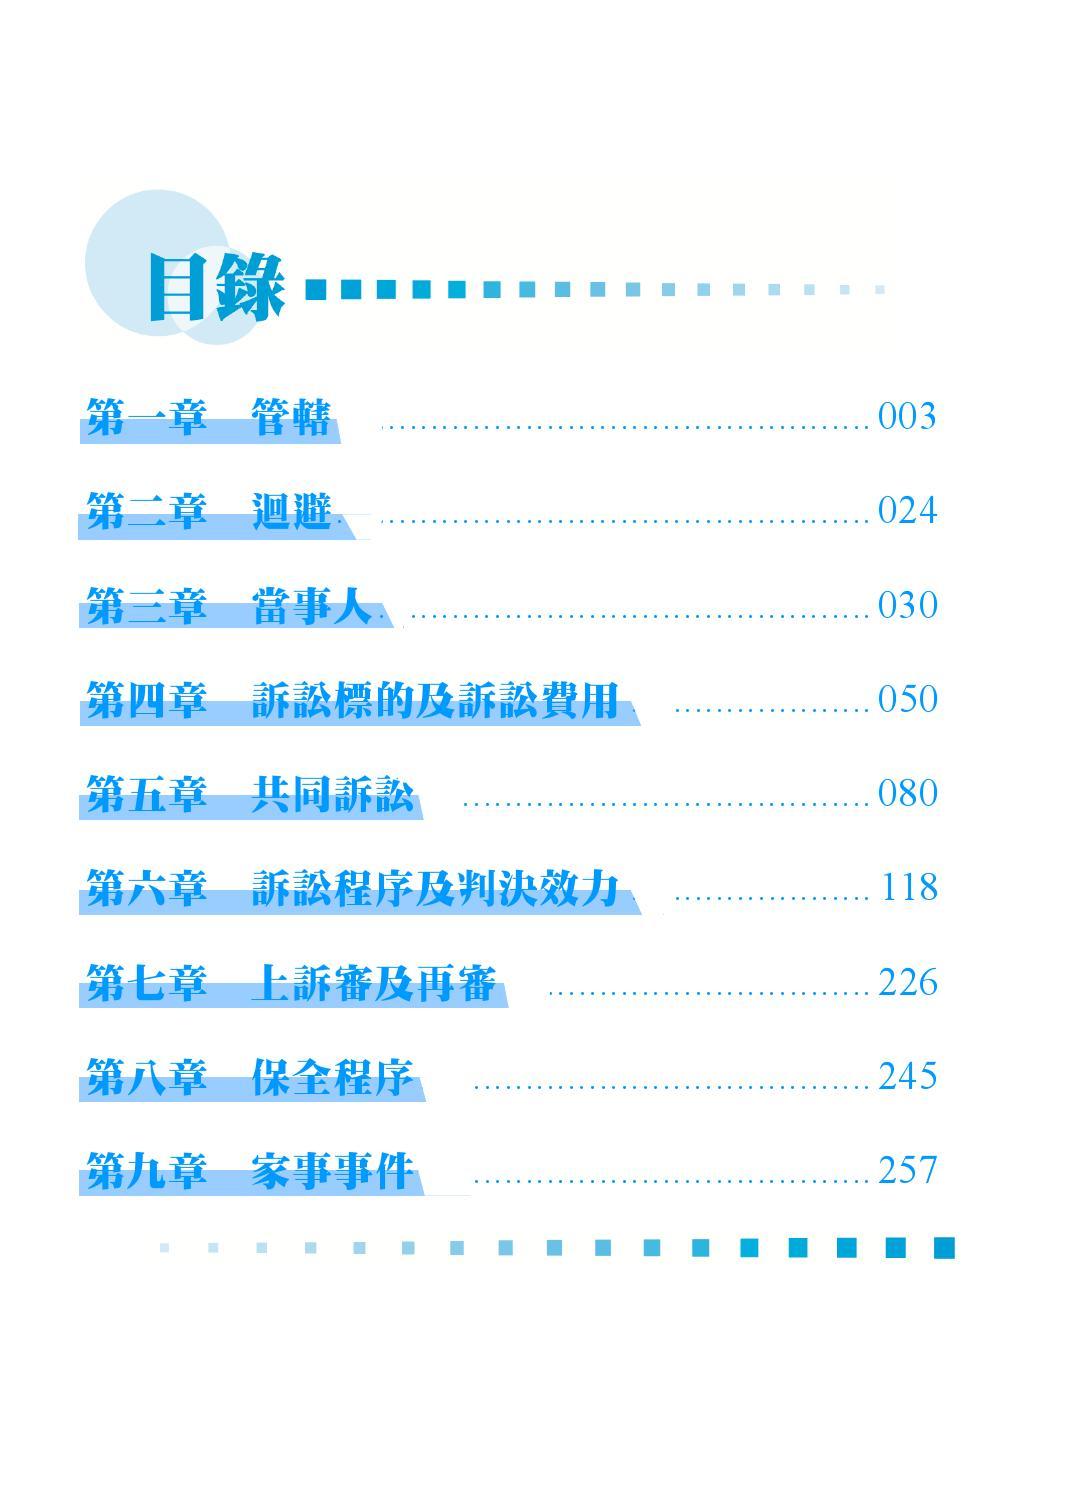 1b805 by 新保成出版社 - Issuu